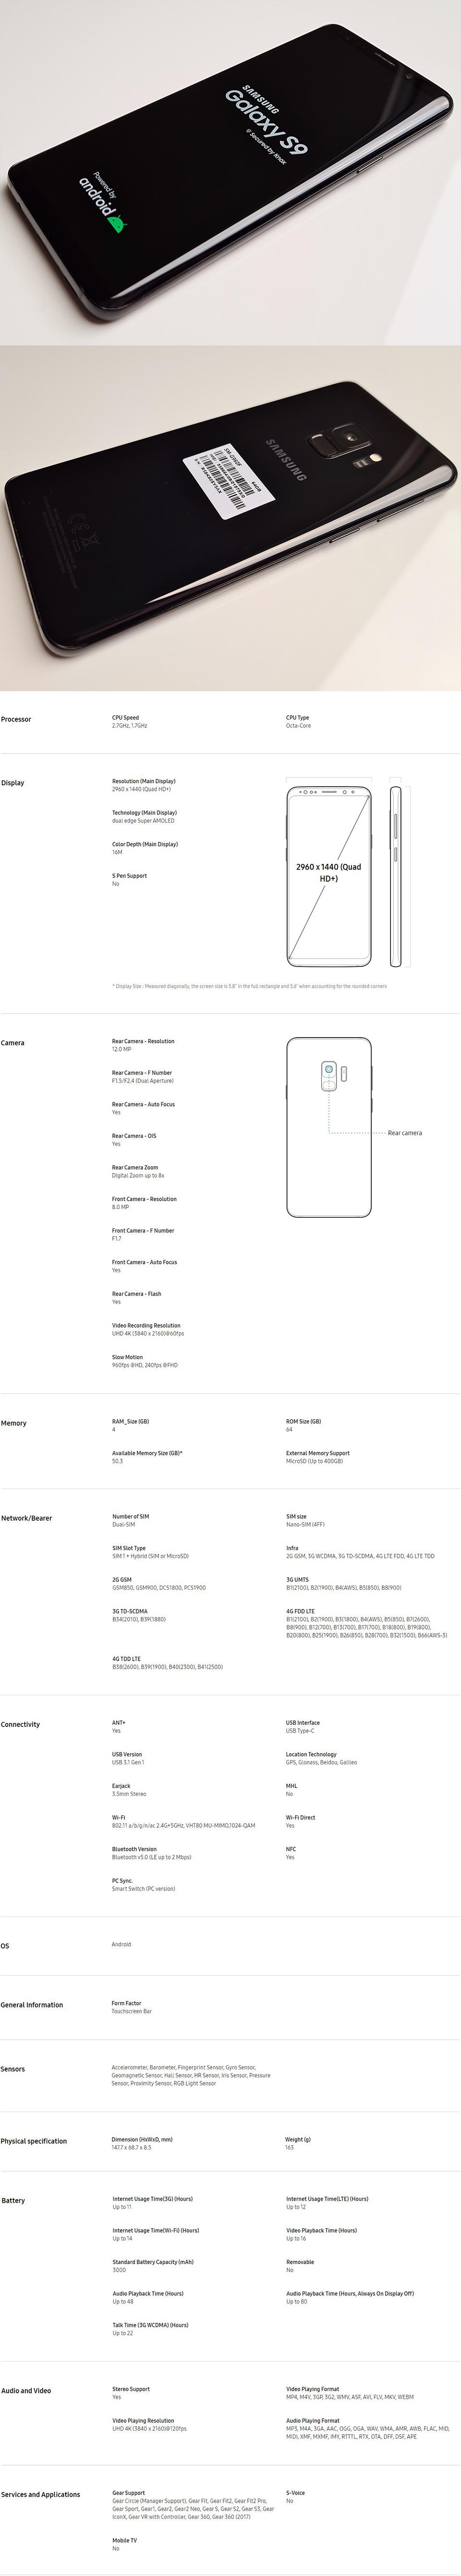 descs9used2 - Samsung Galaxy S9 SM-G960F 64GB Single SIM Midnight Black (Unlocked) PRISTINE